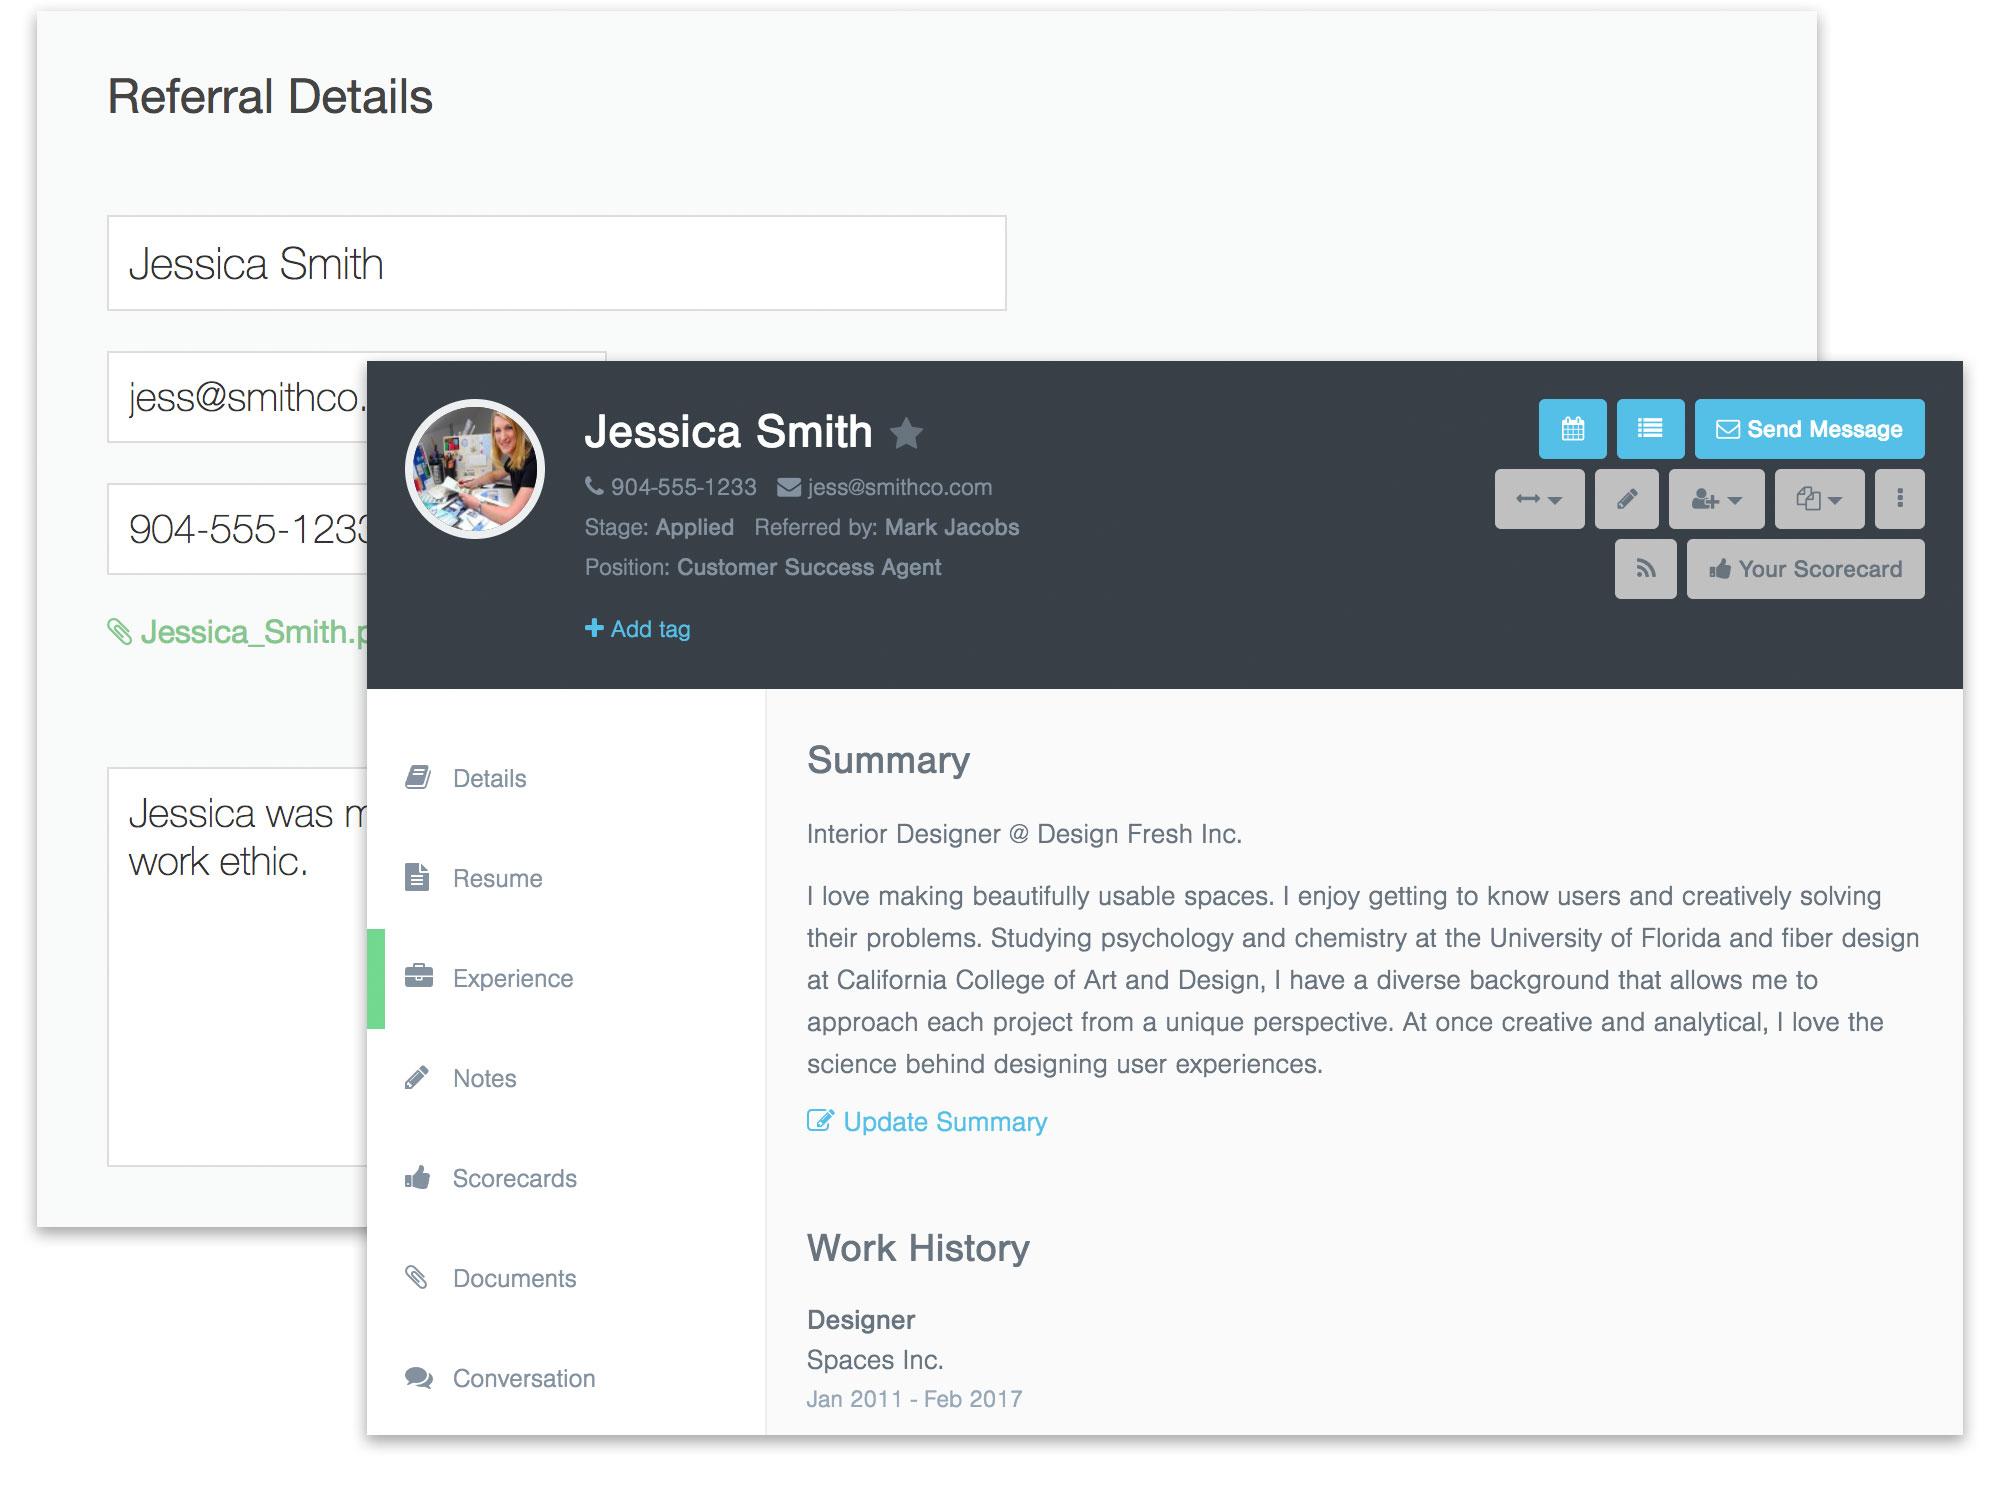 Breezy Software - Simple, effective employee referrals